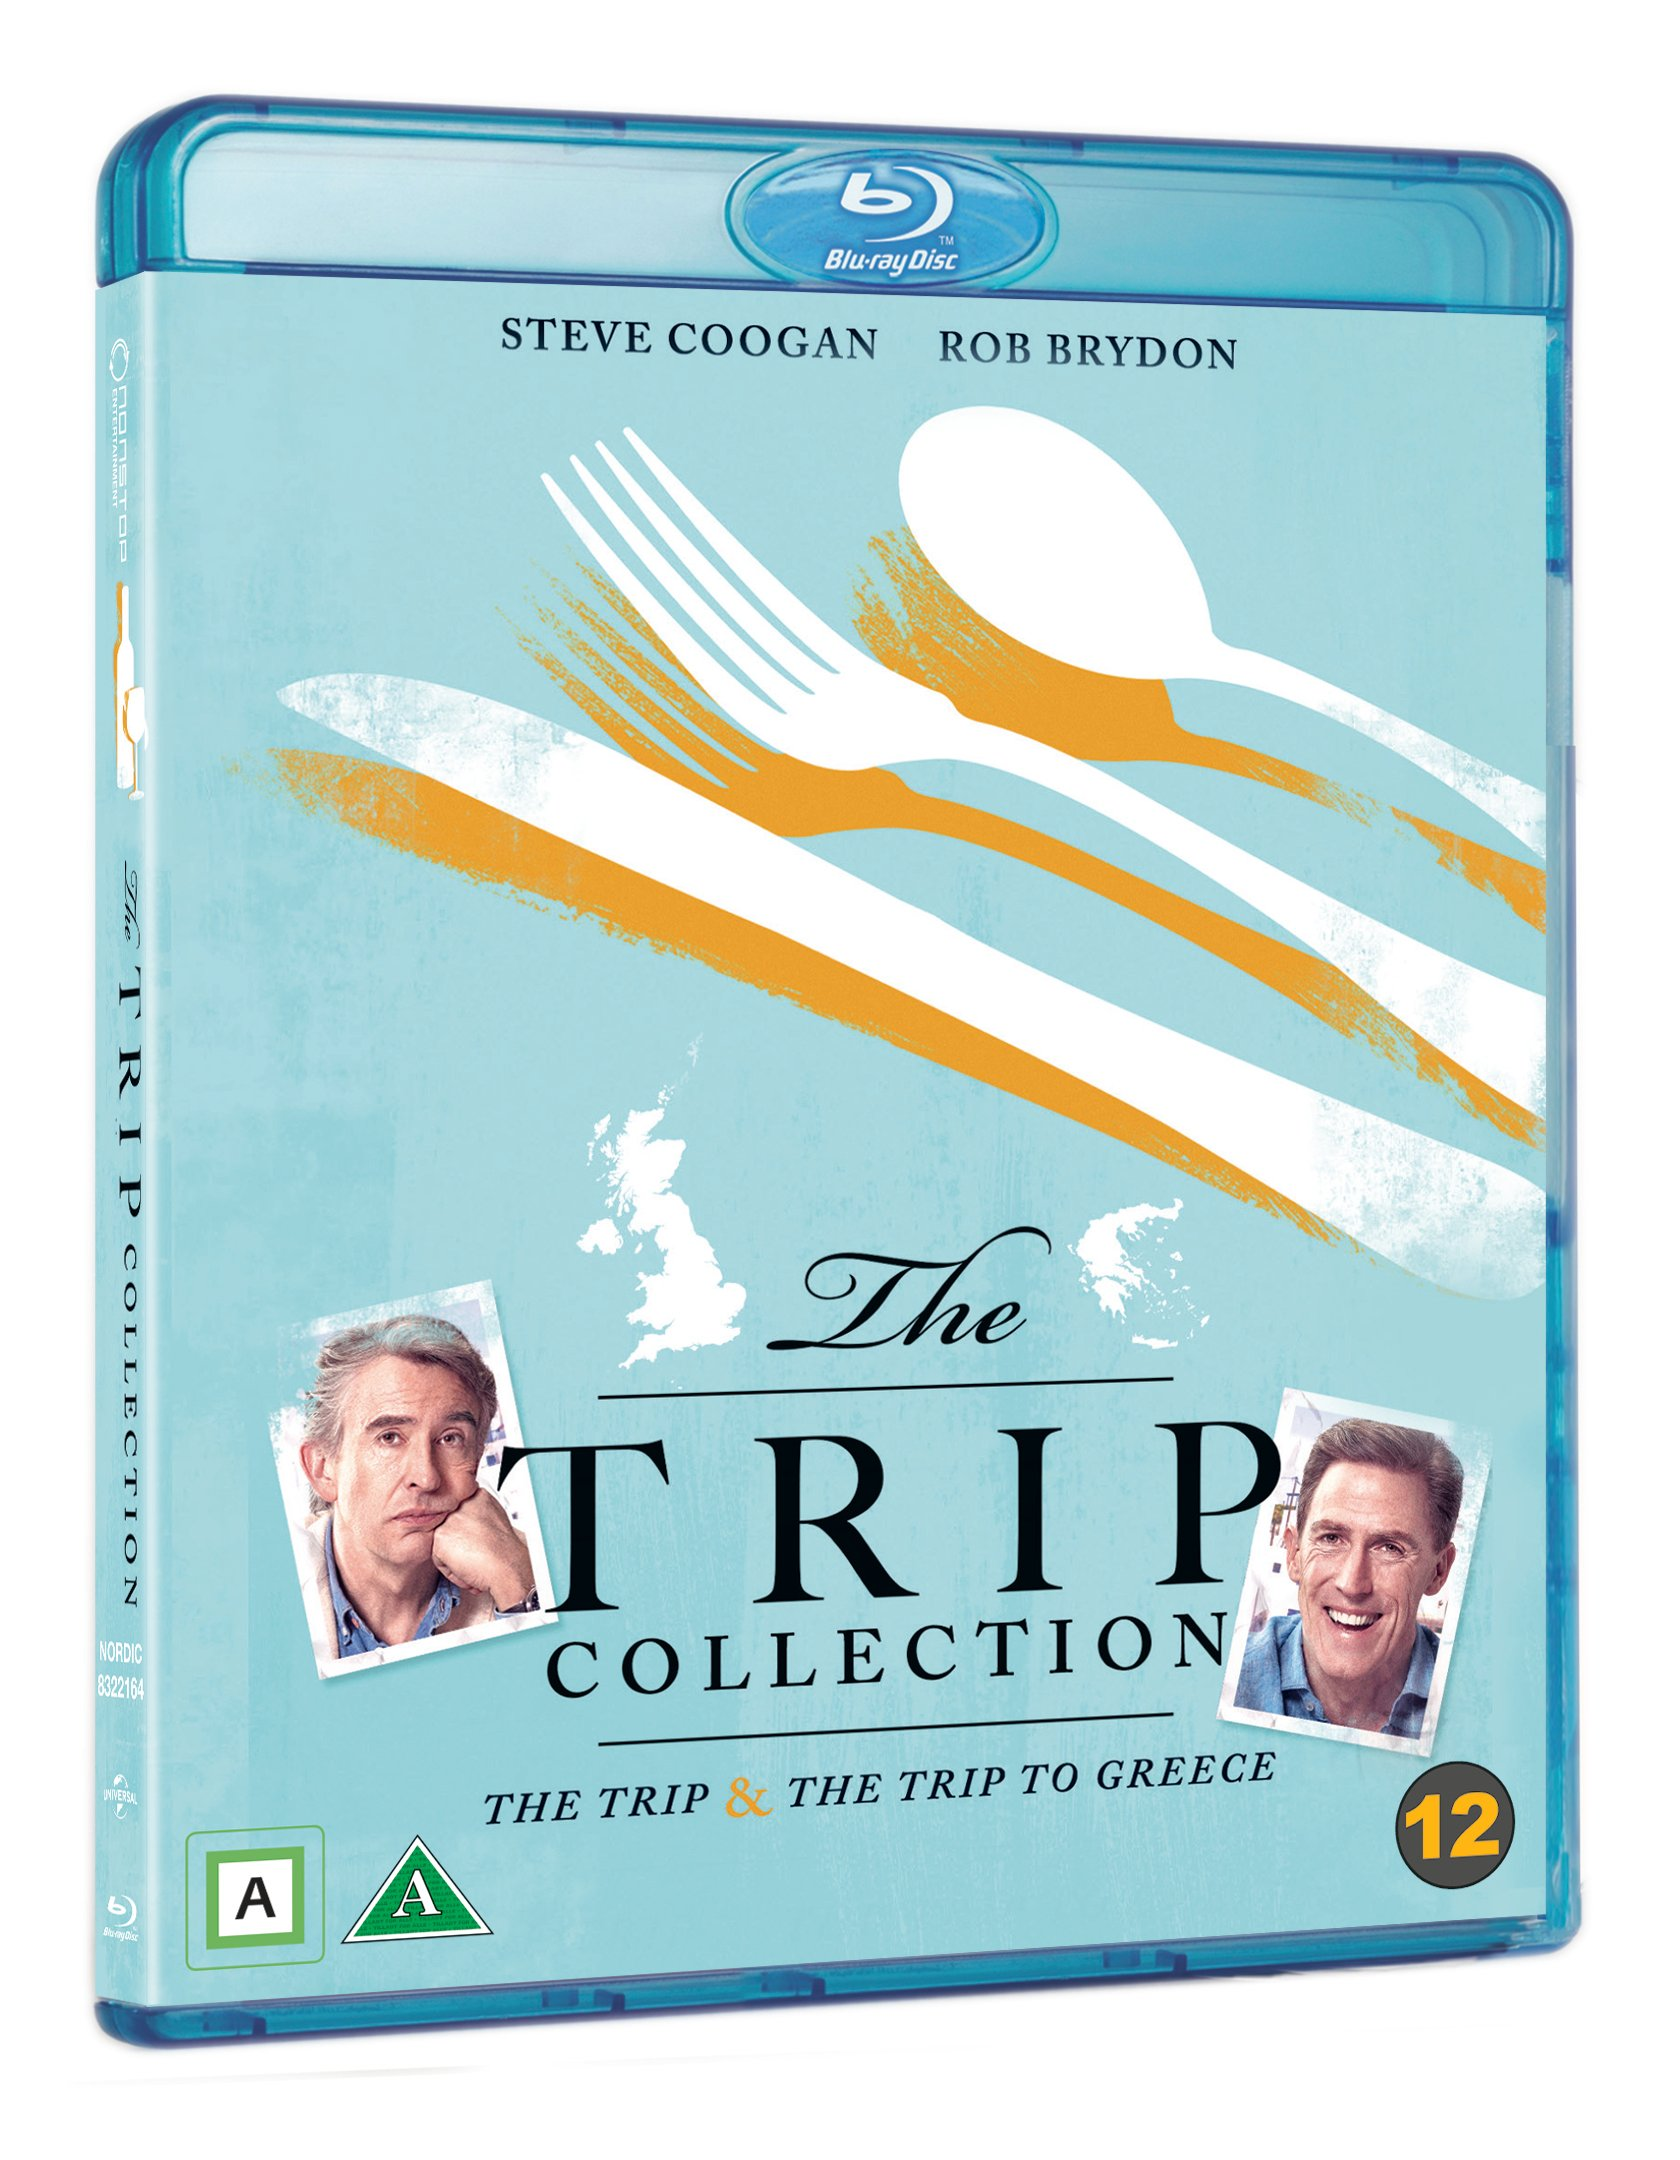 The Trip To Greece & The Trip Box - Blu ray